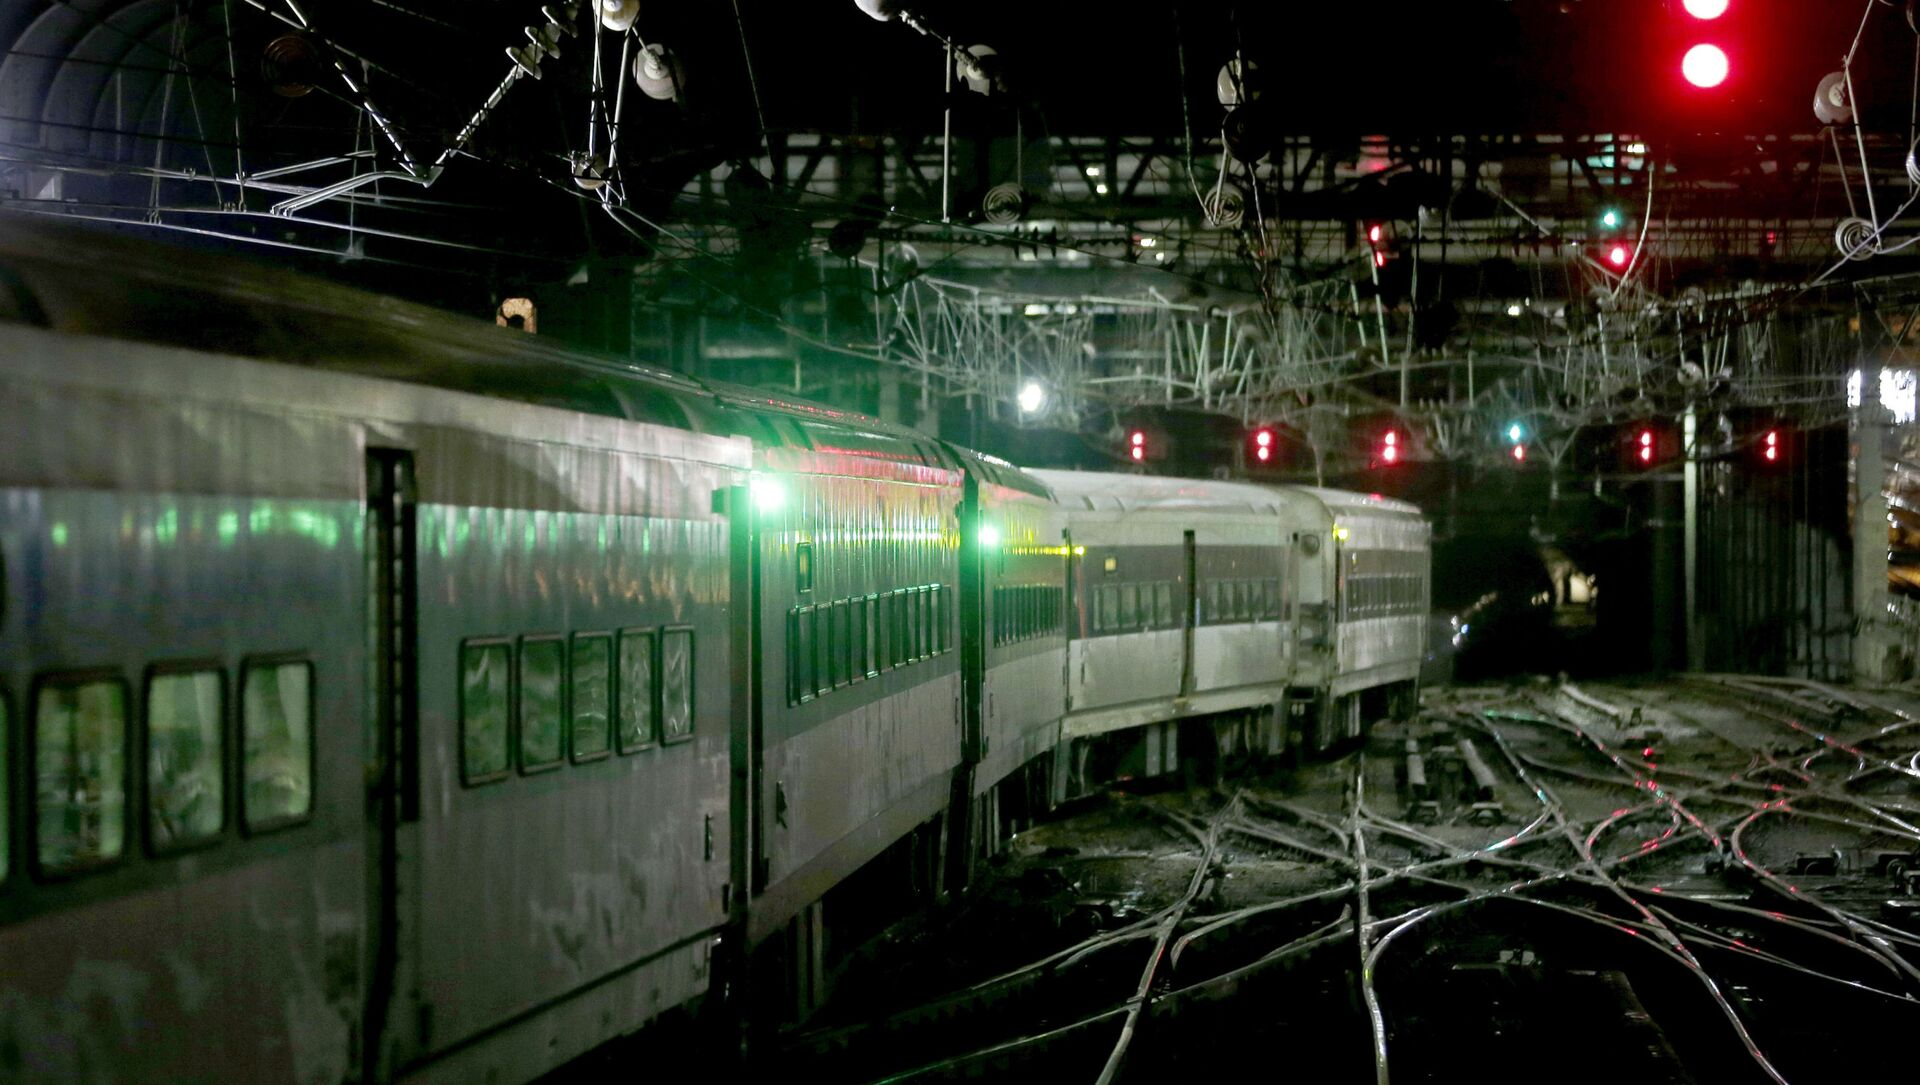 An Amtrak train moves through Penn Station in New York. - Sputnik International, 1920, 05.08.2021